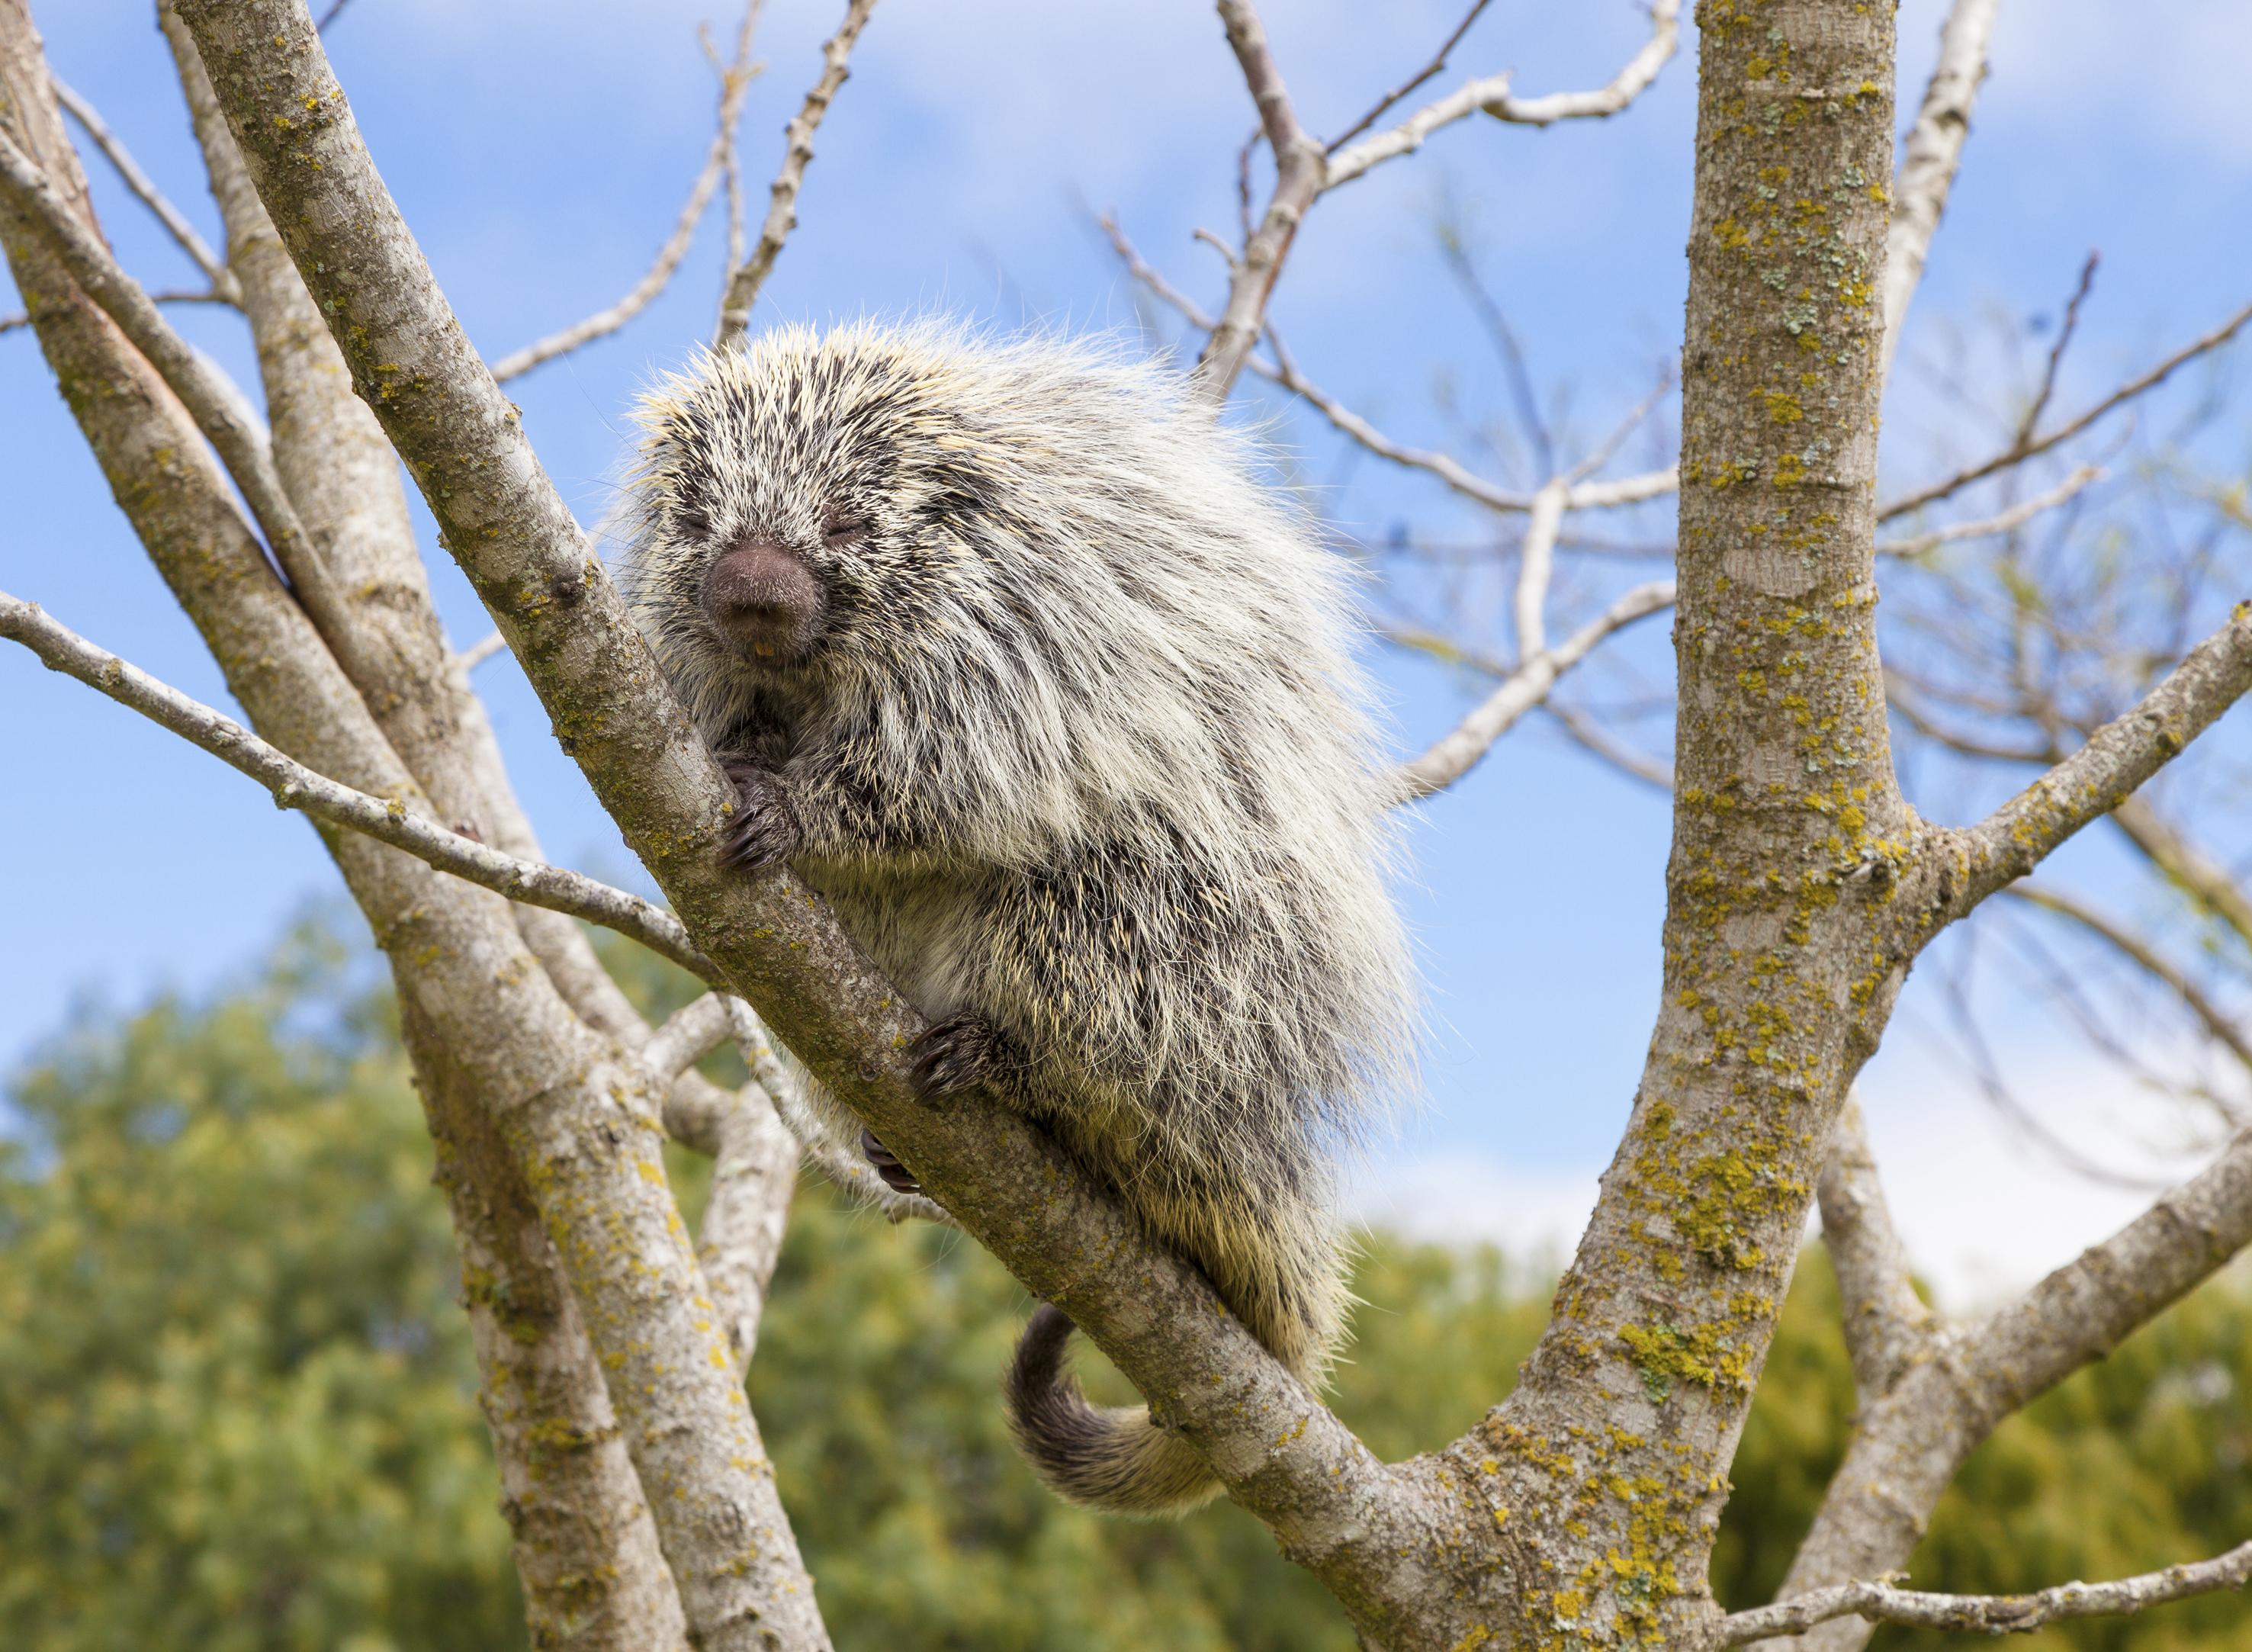 Hairy Tree Porcupine